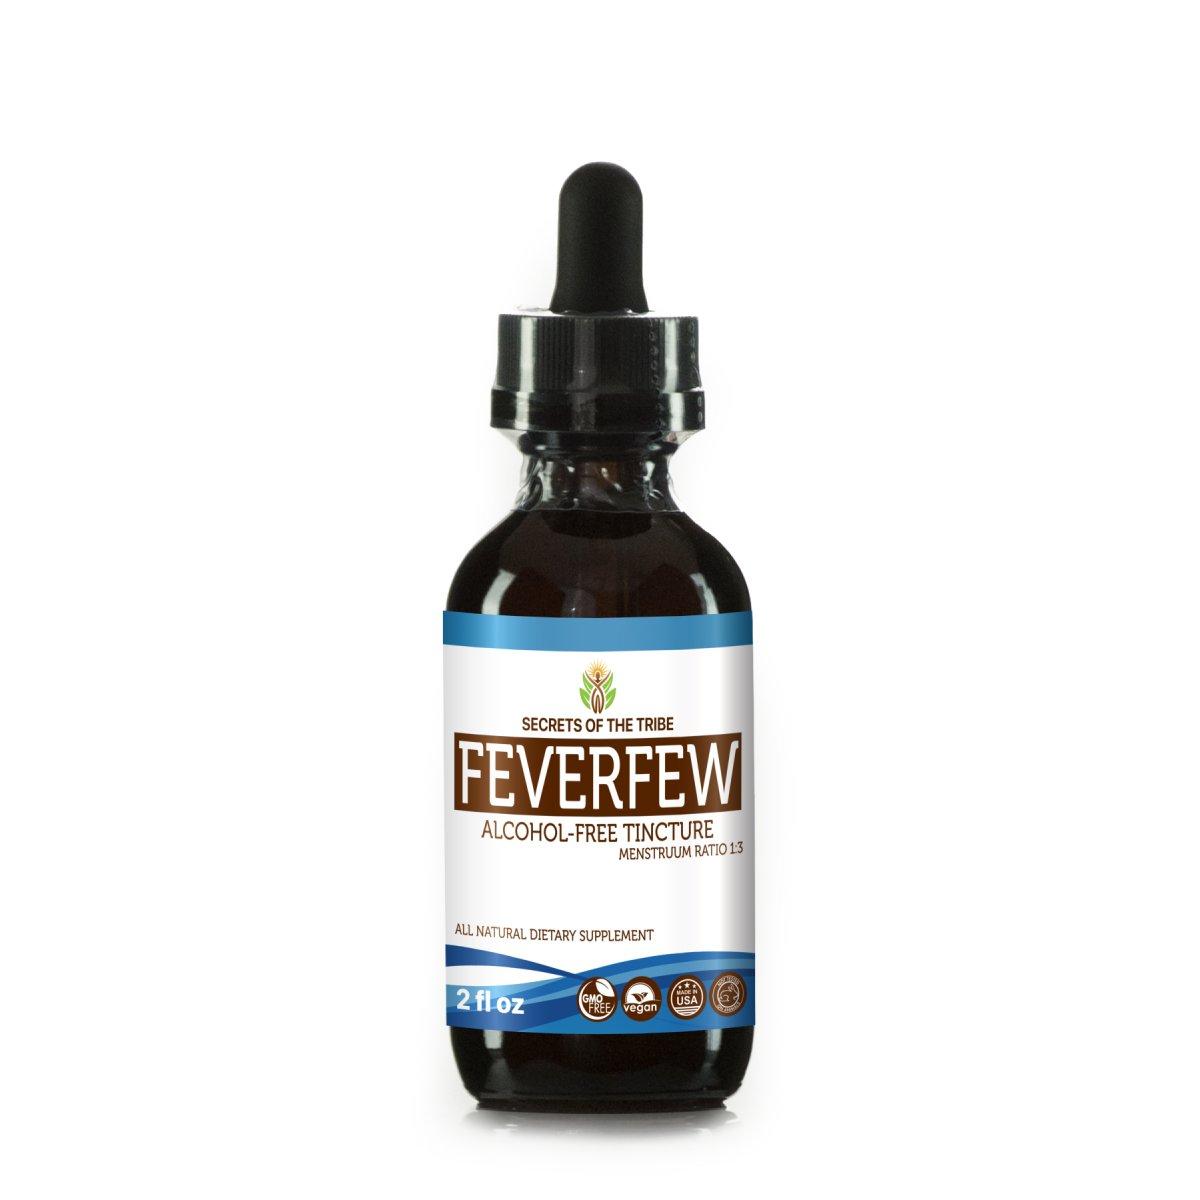 Feverfew Tincture Alcohol-Free Liquid Extract, Organic Feverfew (Tanacetum parthenium) Dried Herb (2 FL OZ)